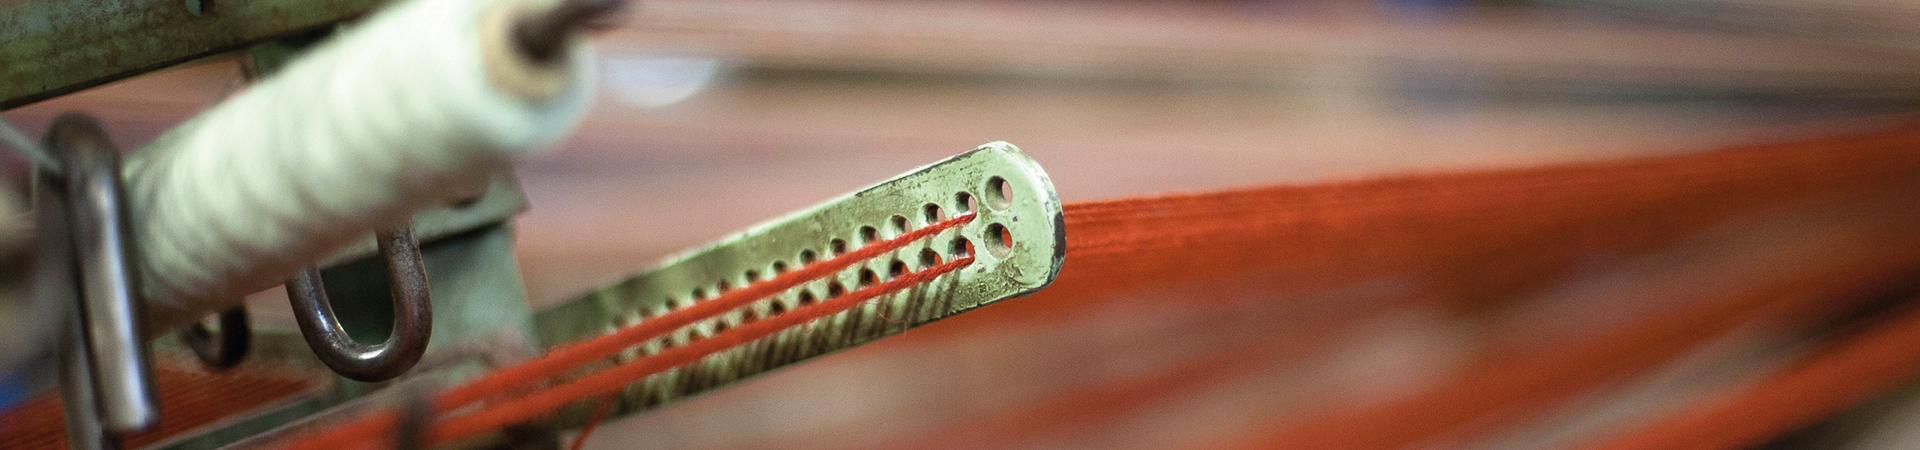 Why choose Wilotn - Yarn on loom closeup